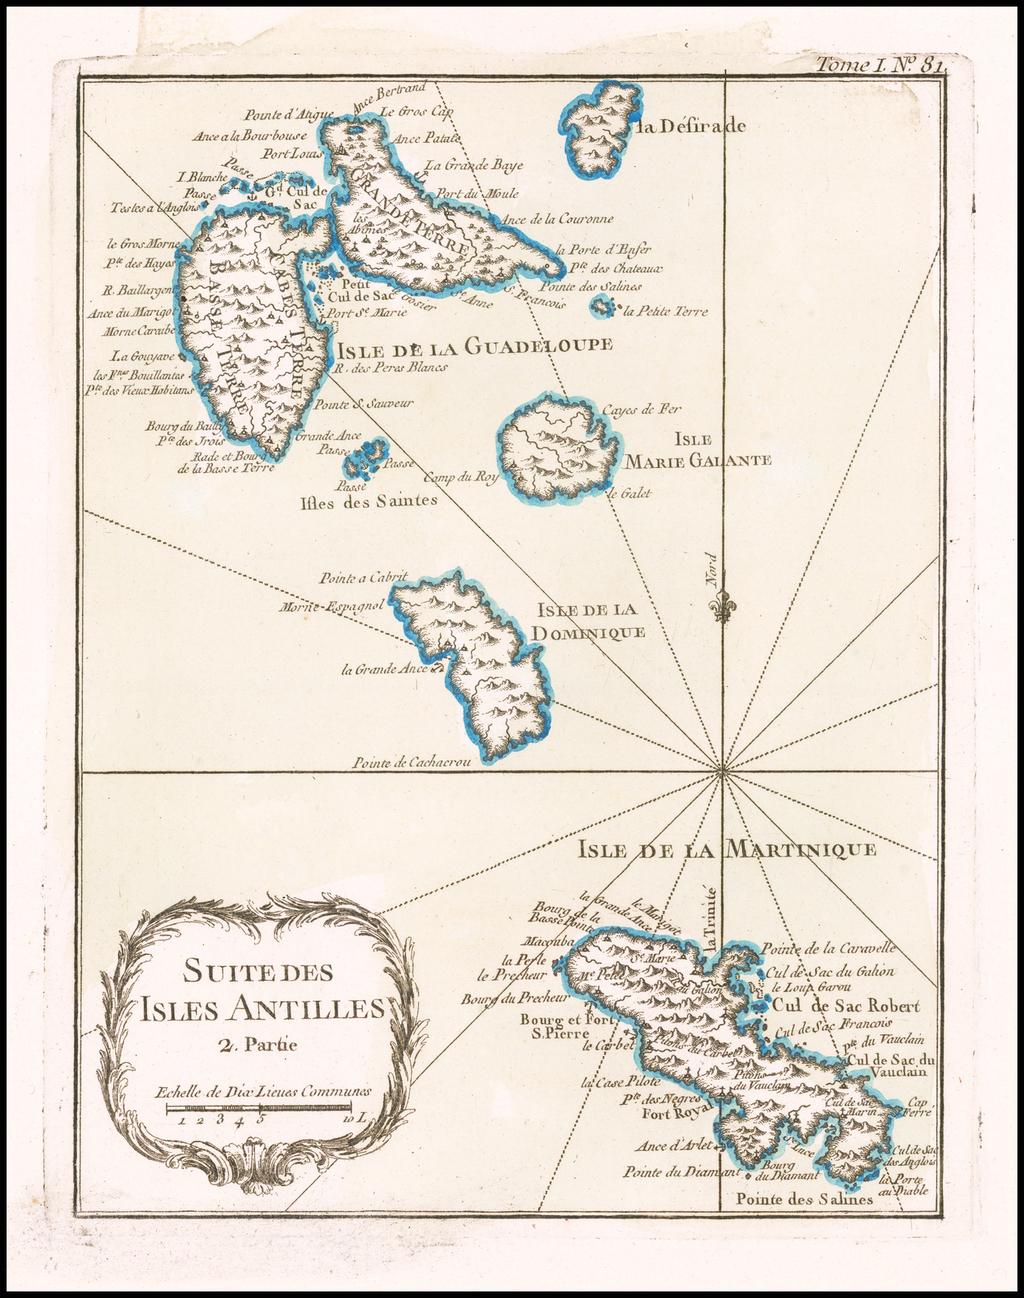 [Martinique, Guadaloupe, Dominica and Marie Galante] . Suite des Isles Antilles 2. Partie By Jacques Nicolas Bellin